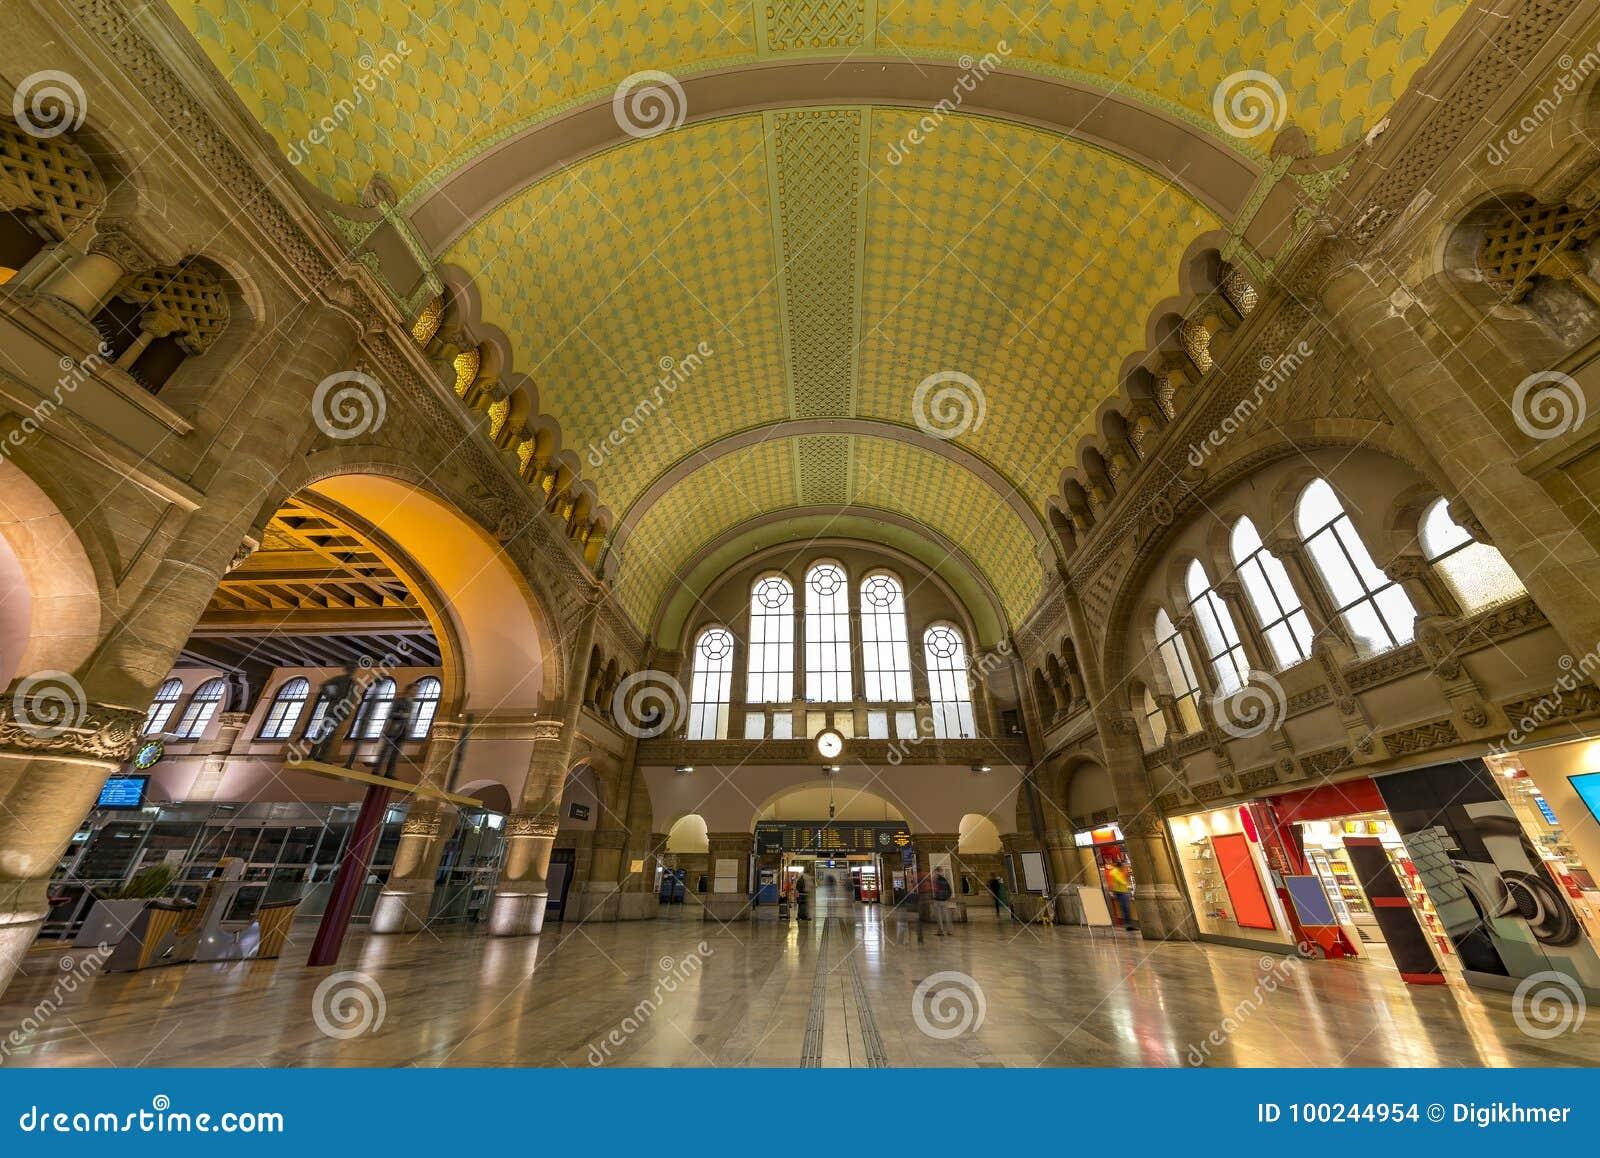 Train station entrance hall